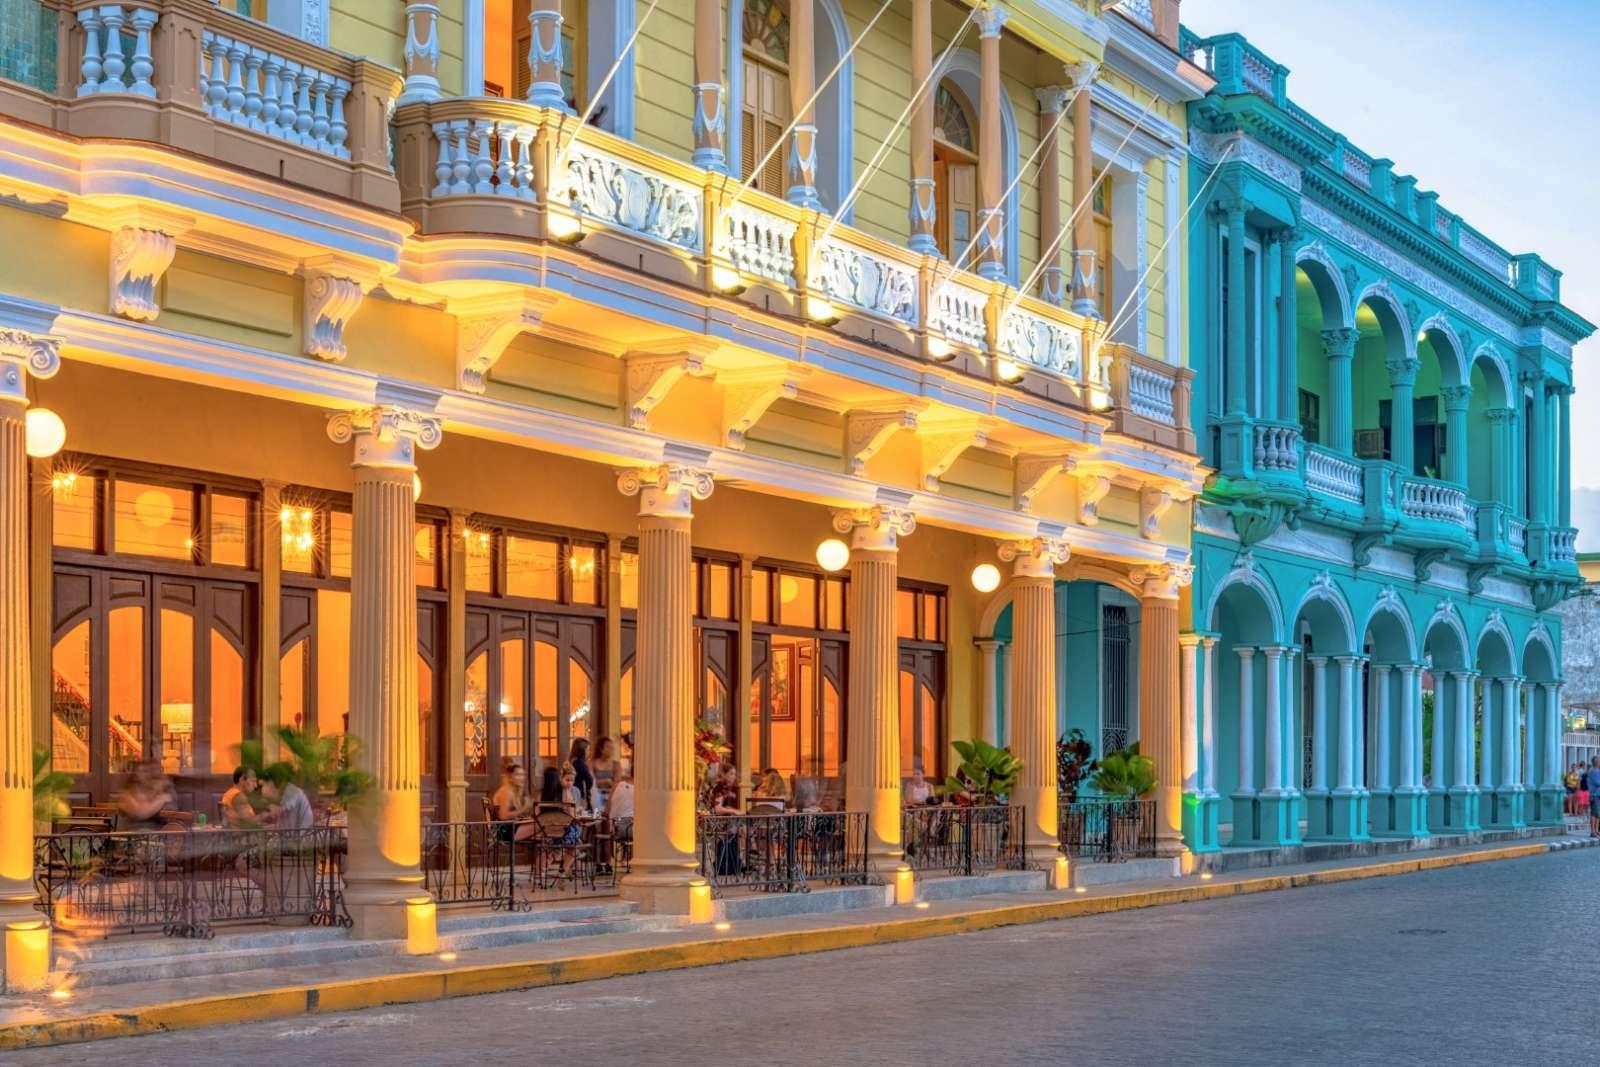 The Hotel Central in Santa Clara, Cuba